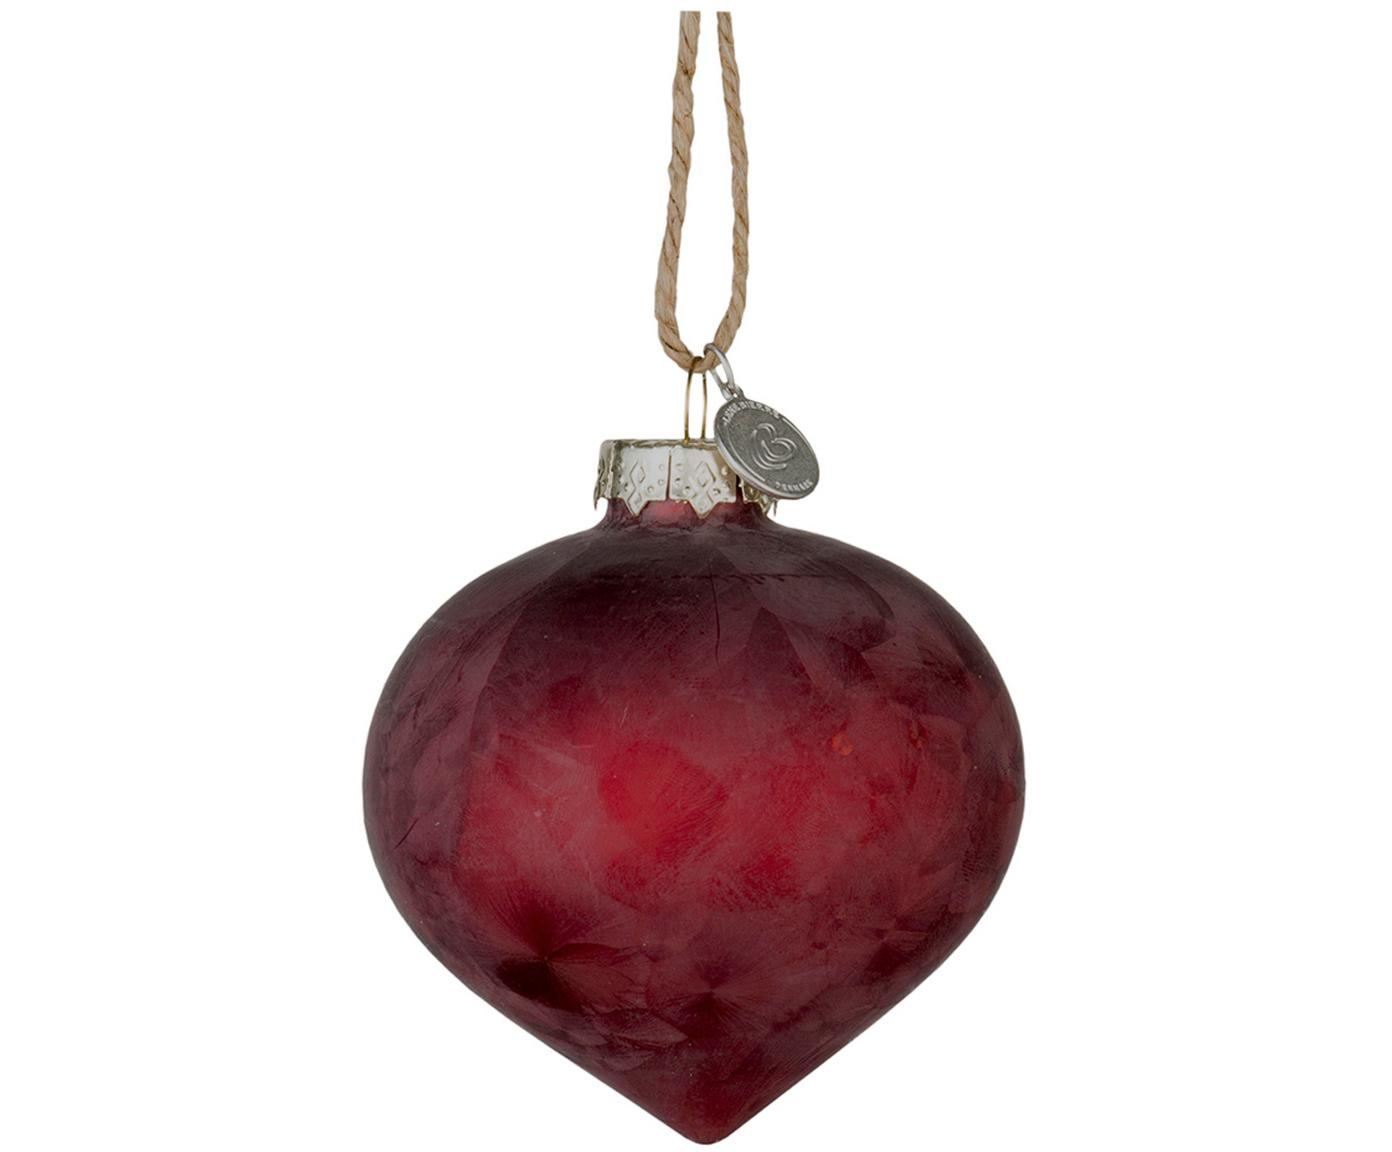 Baumanhänger Velma, 2 Stück, Granatapfelrot, Ø 8 x H 9 cm